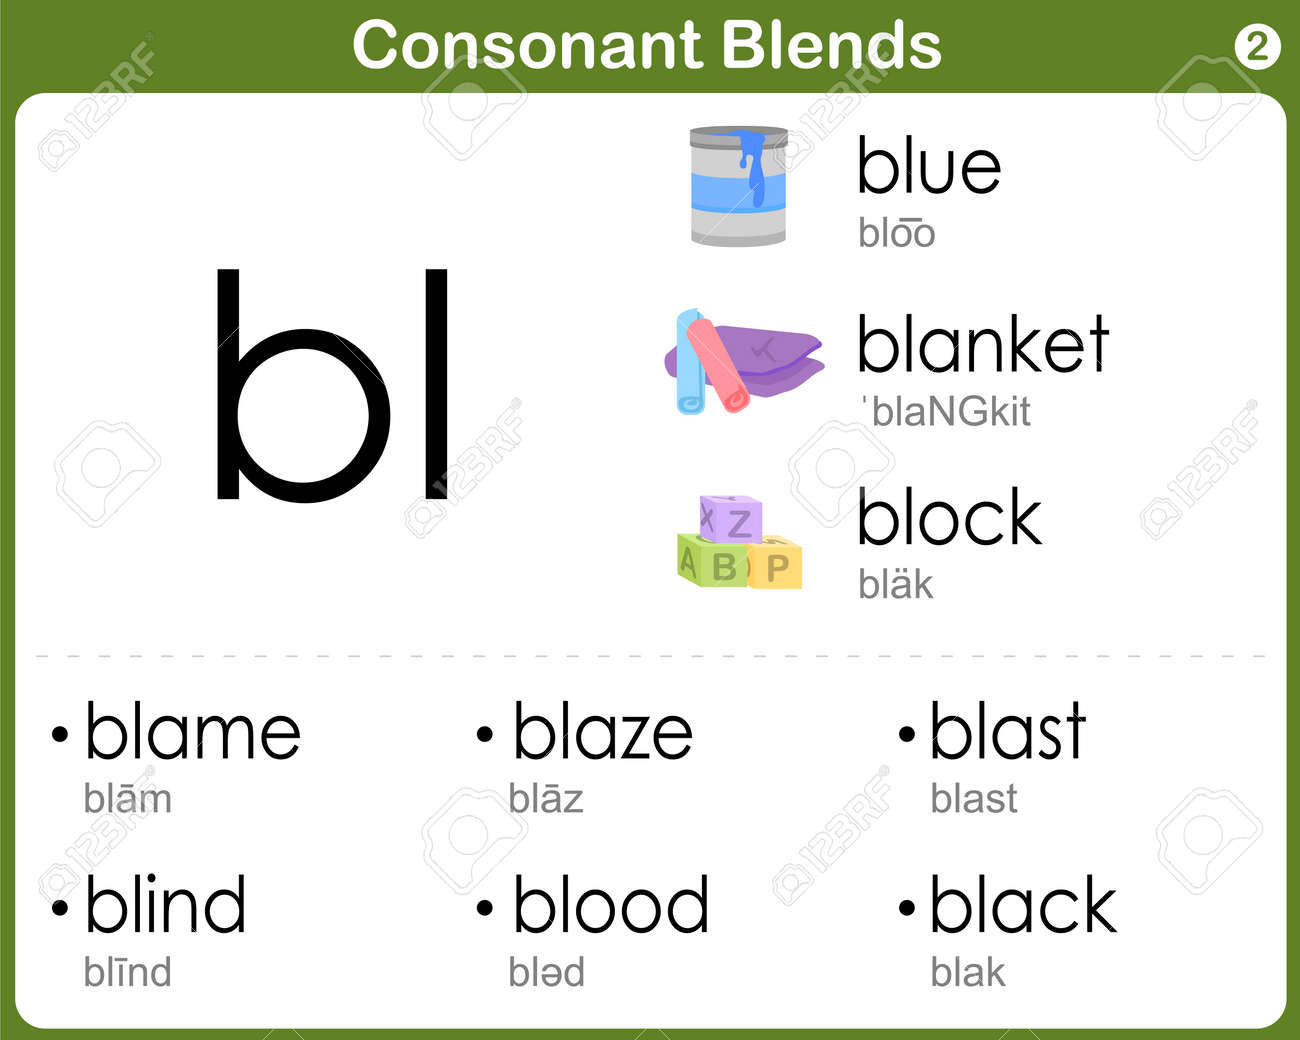 worksheet Consonant Blend Worksheets consonant blends worksheet for kids royalty free cliparts vectors stock vector 36646107